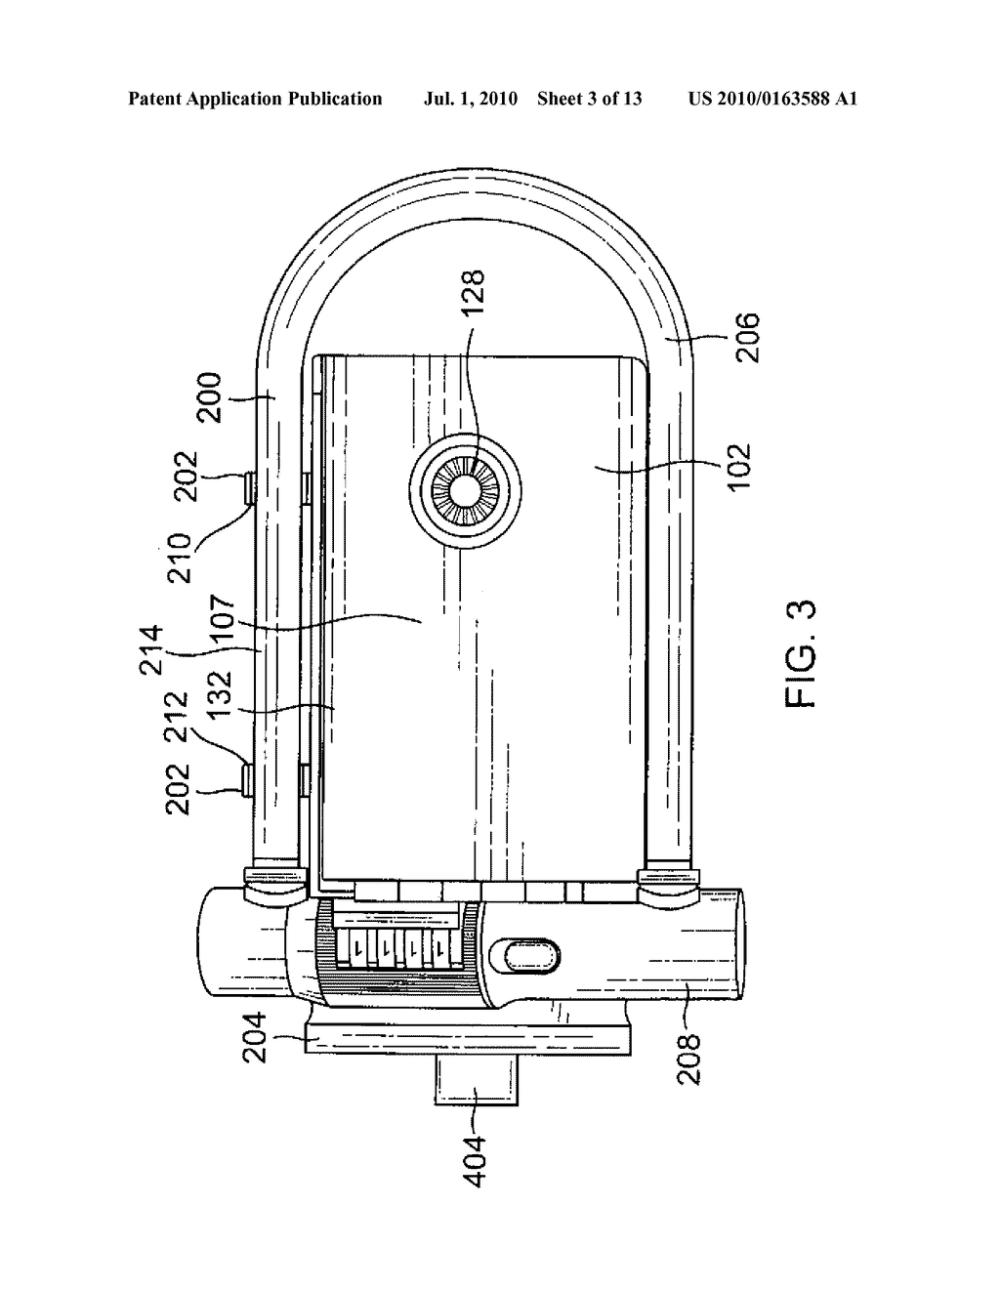 medium resolution of bike lock diagram wiring diagram portal lock picking diagram bike lock diagram